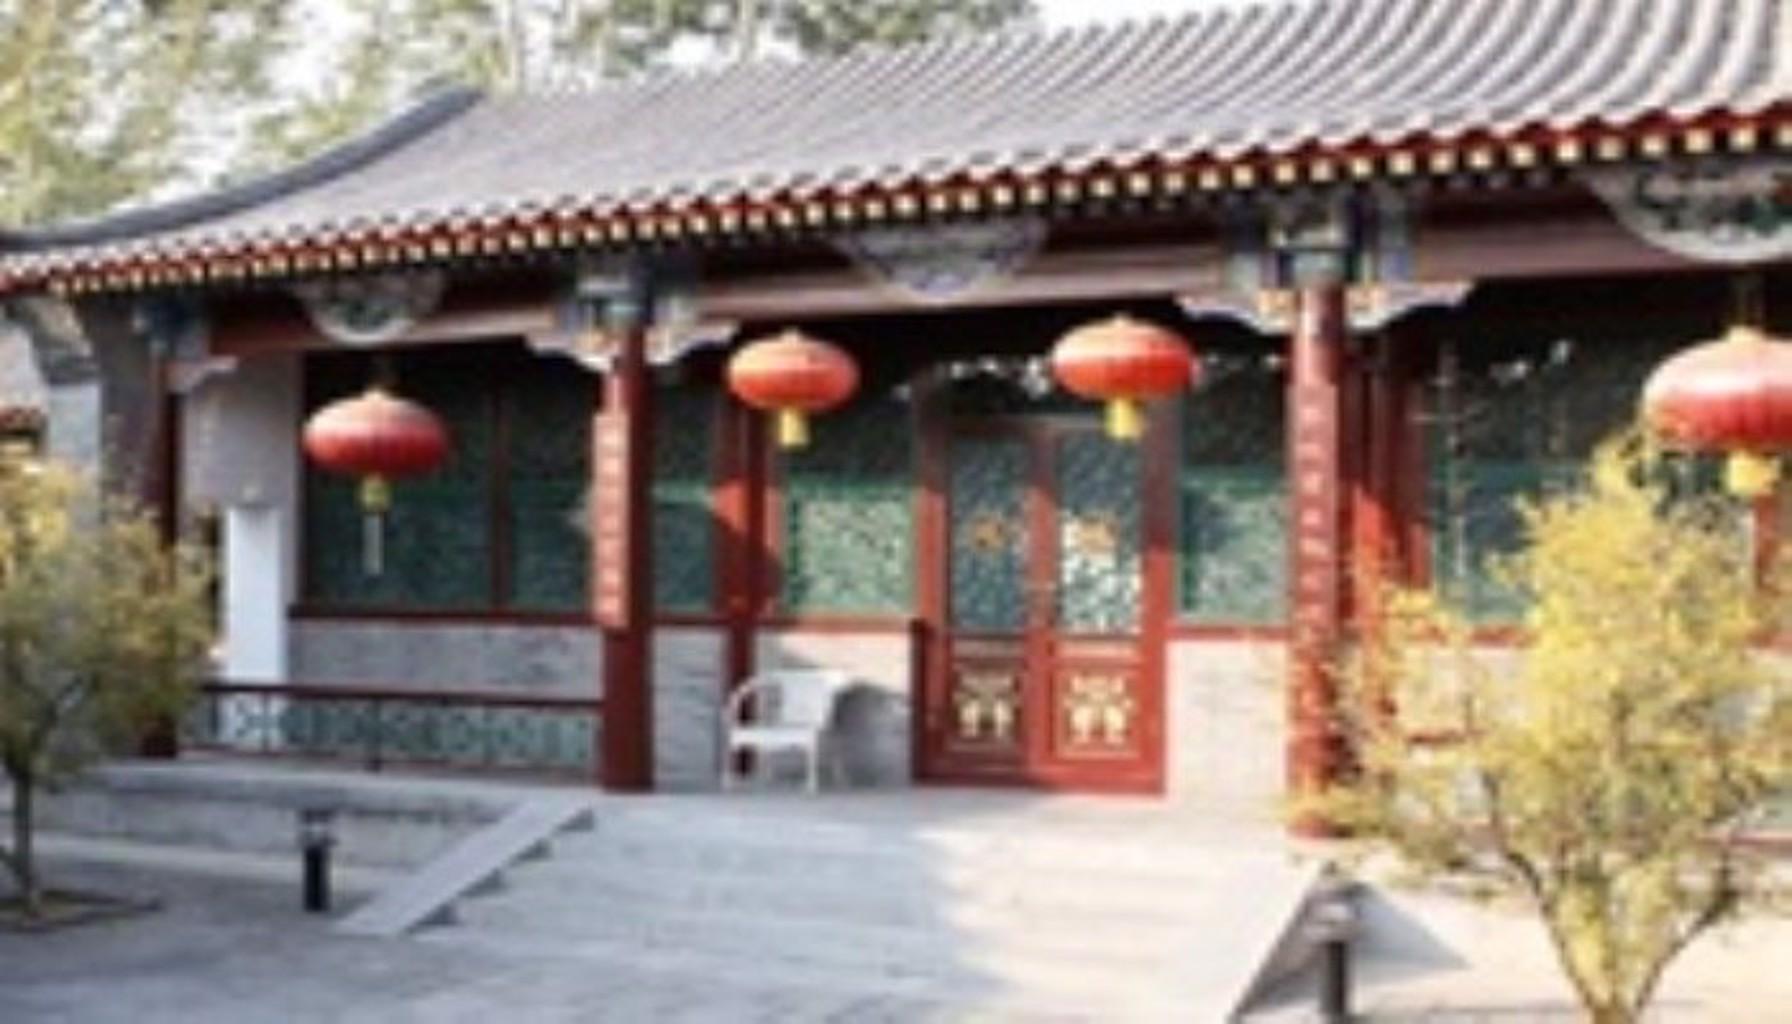 Gallery image of Yun Meng Yuan